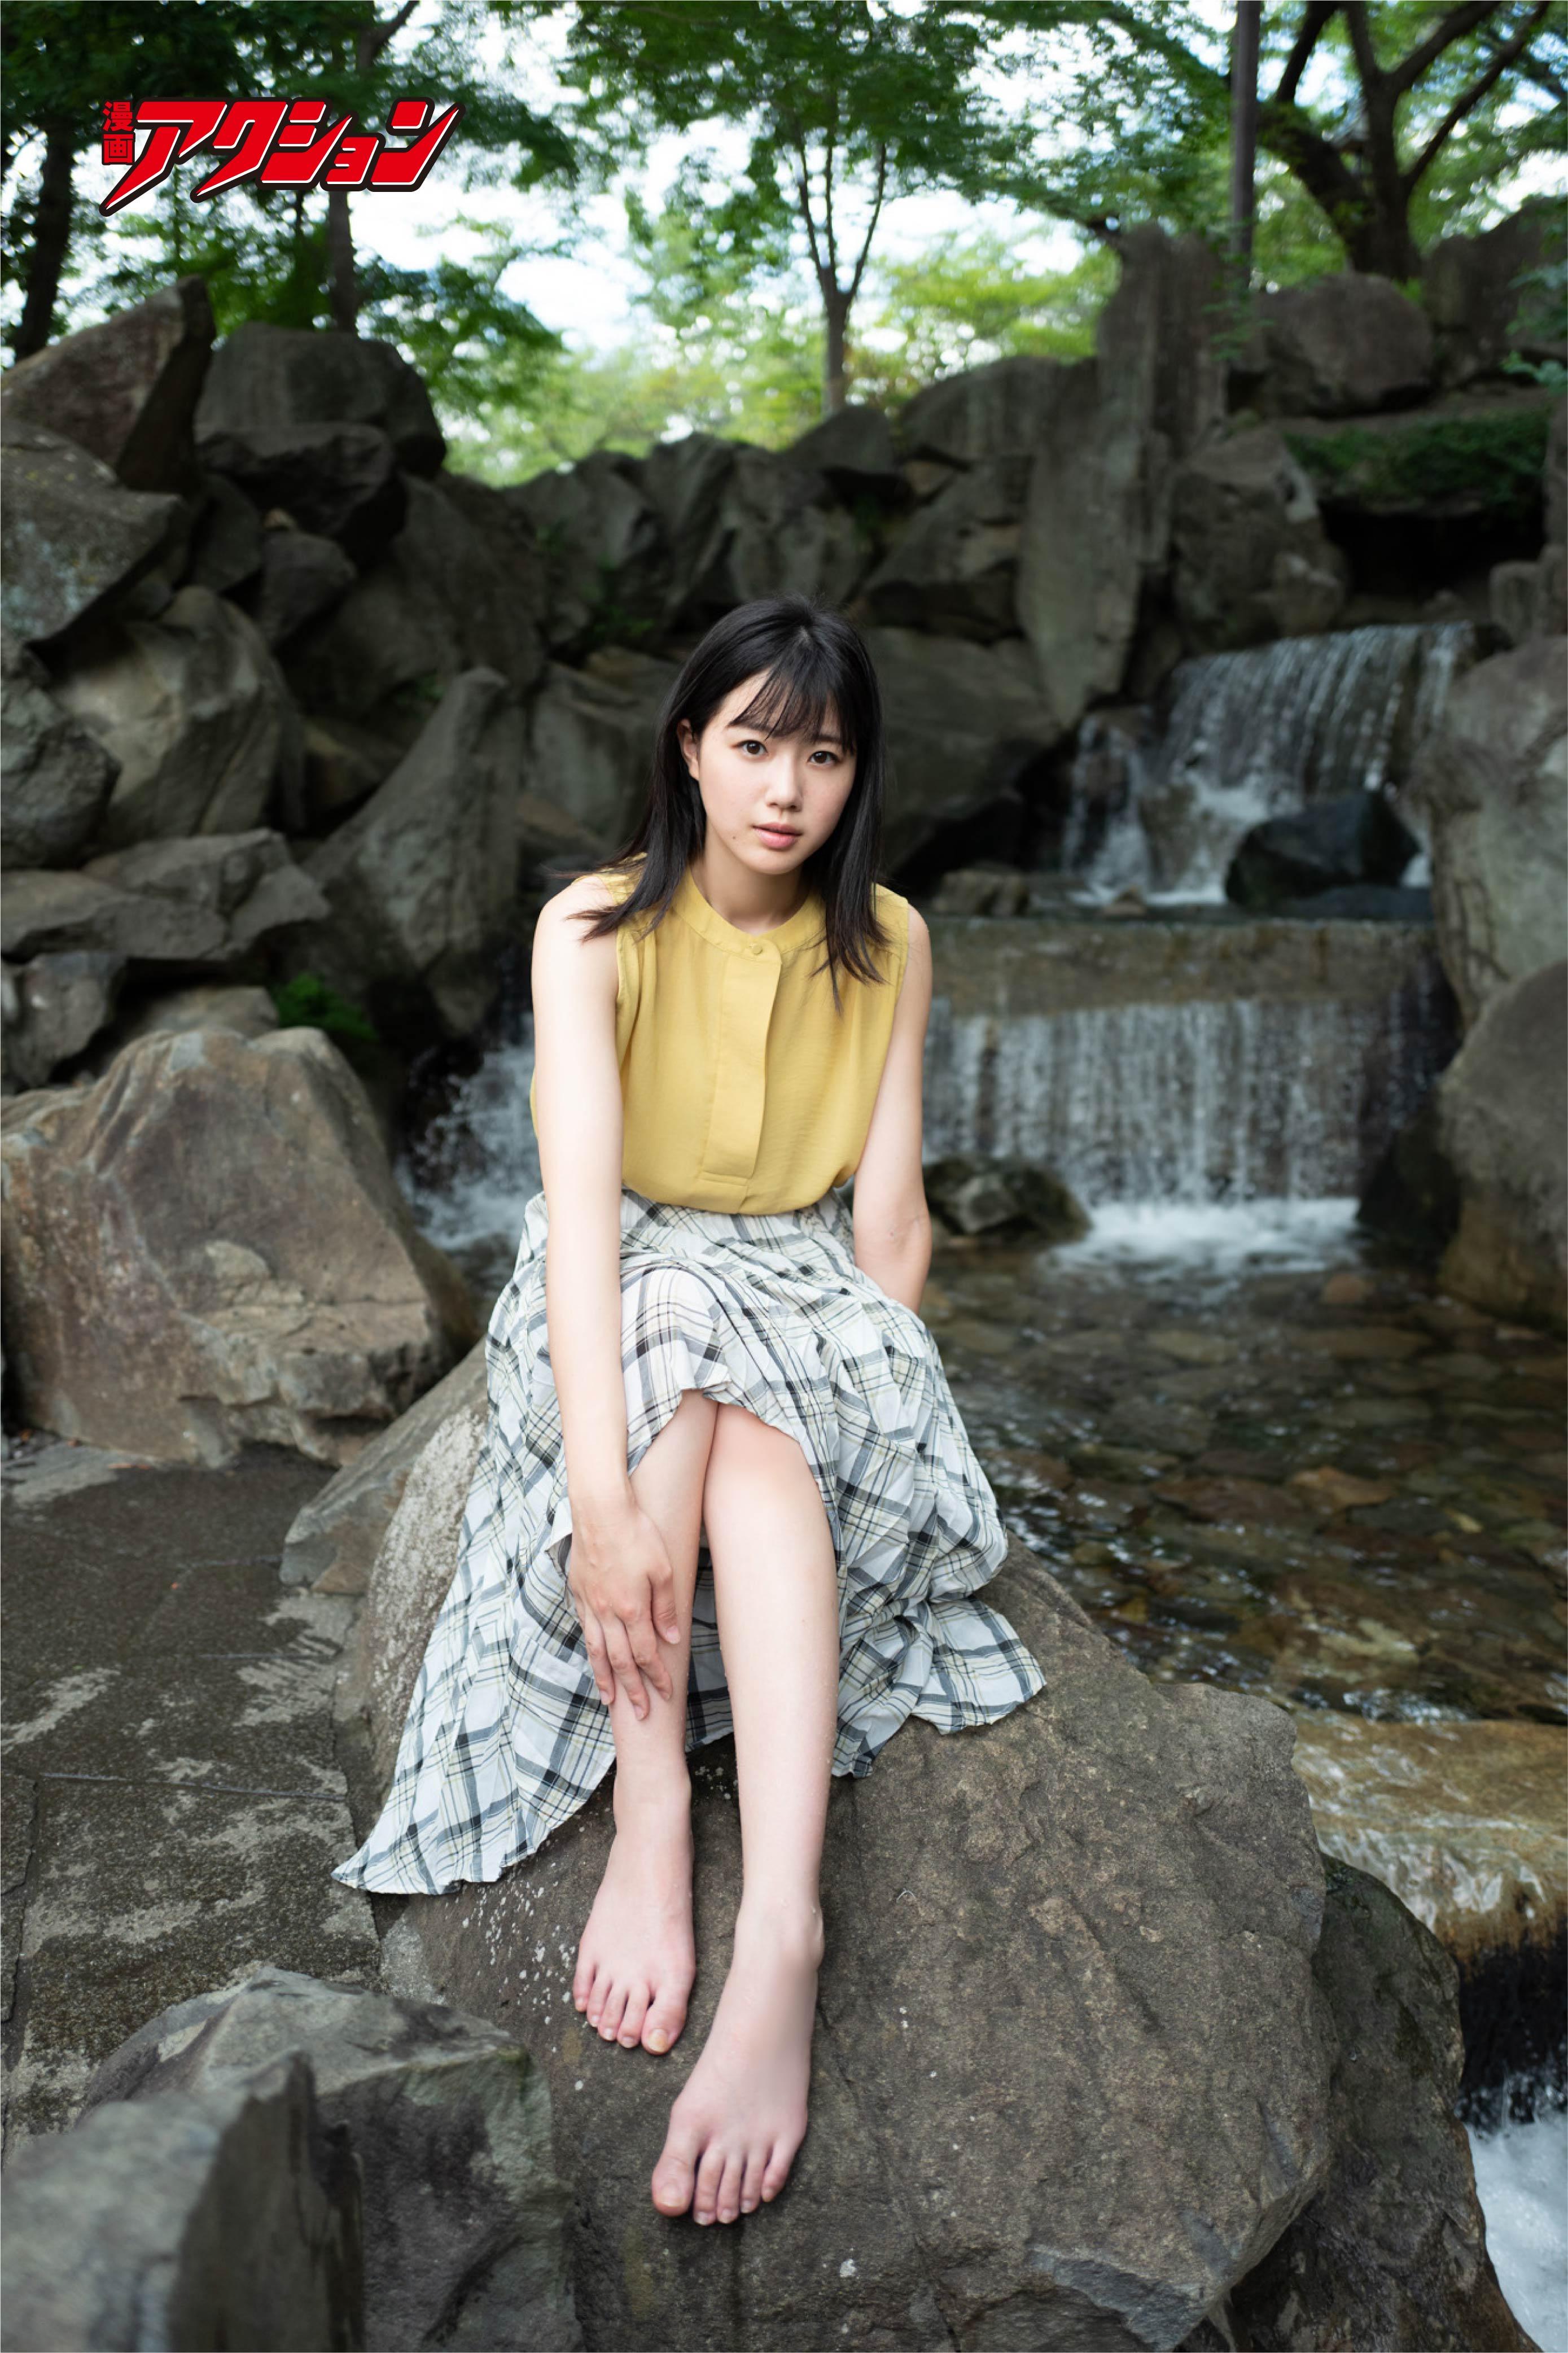 STU48瀧野由美子が『漫画アクション』の表紙巻頭グラビアに登場!【写真7枚】の画像002